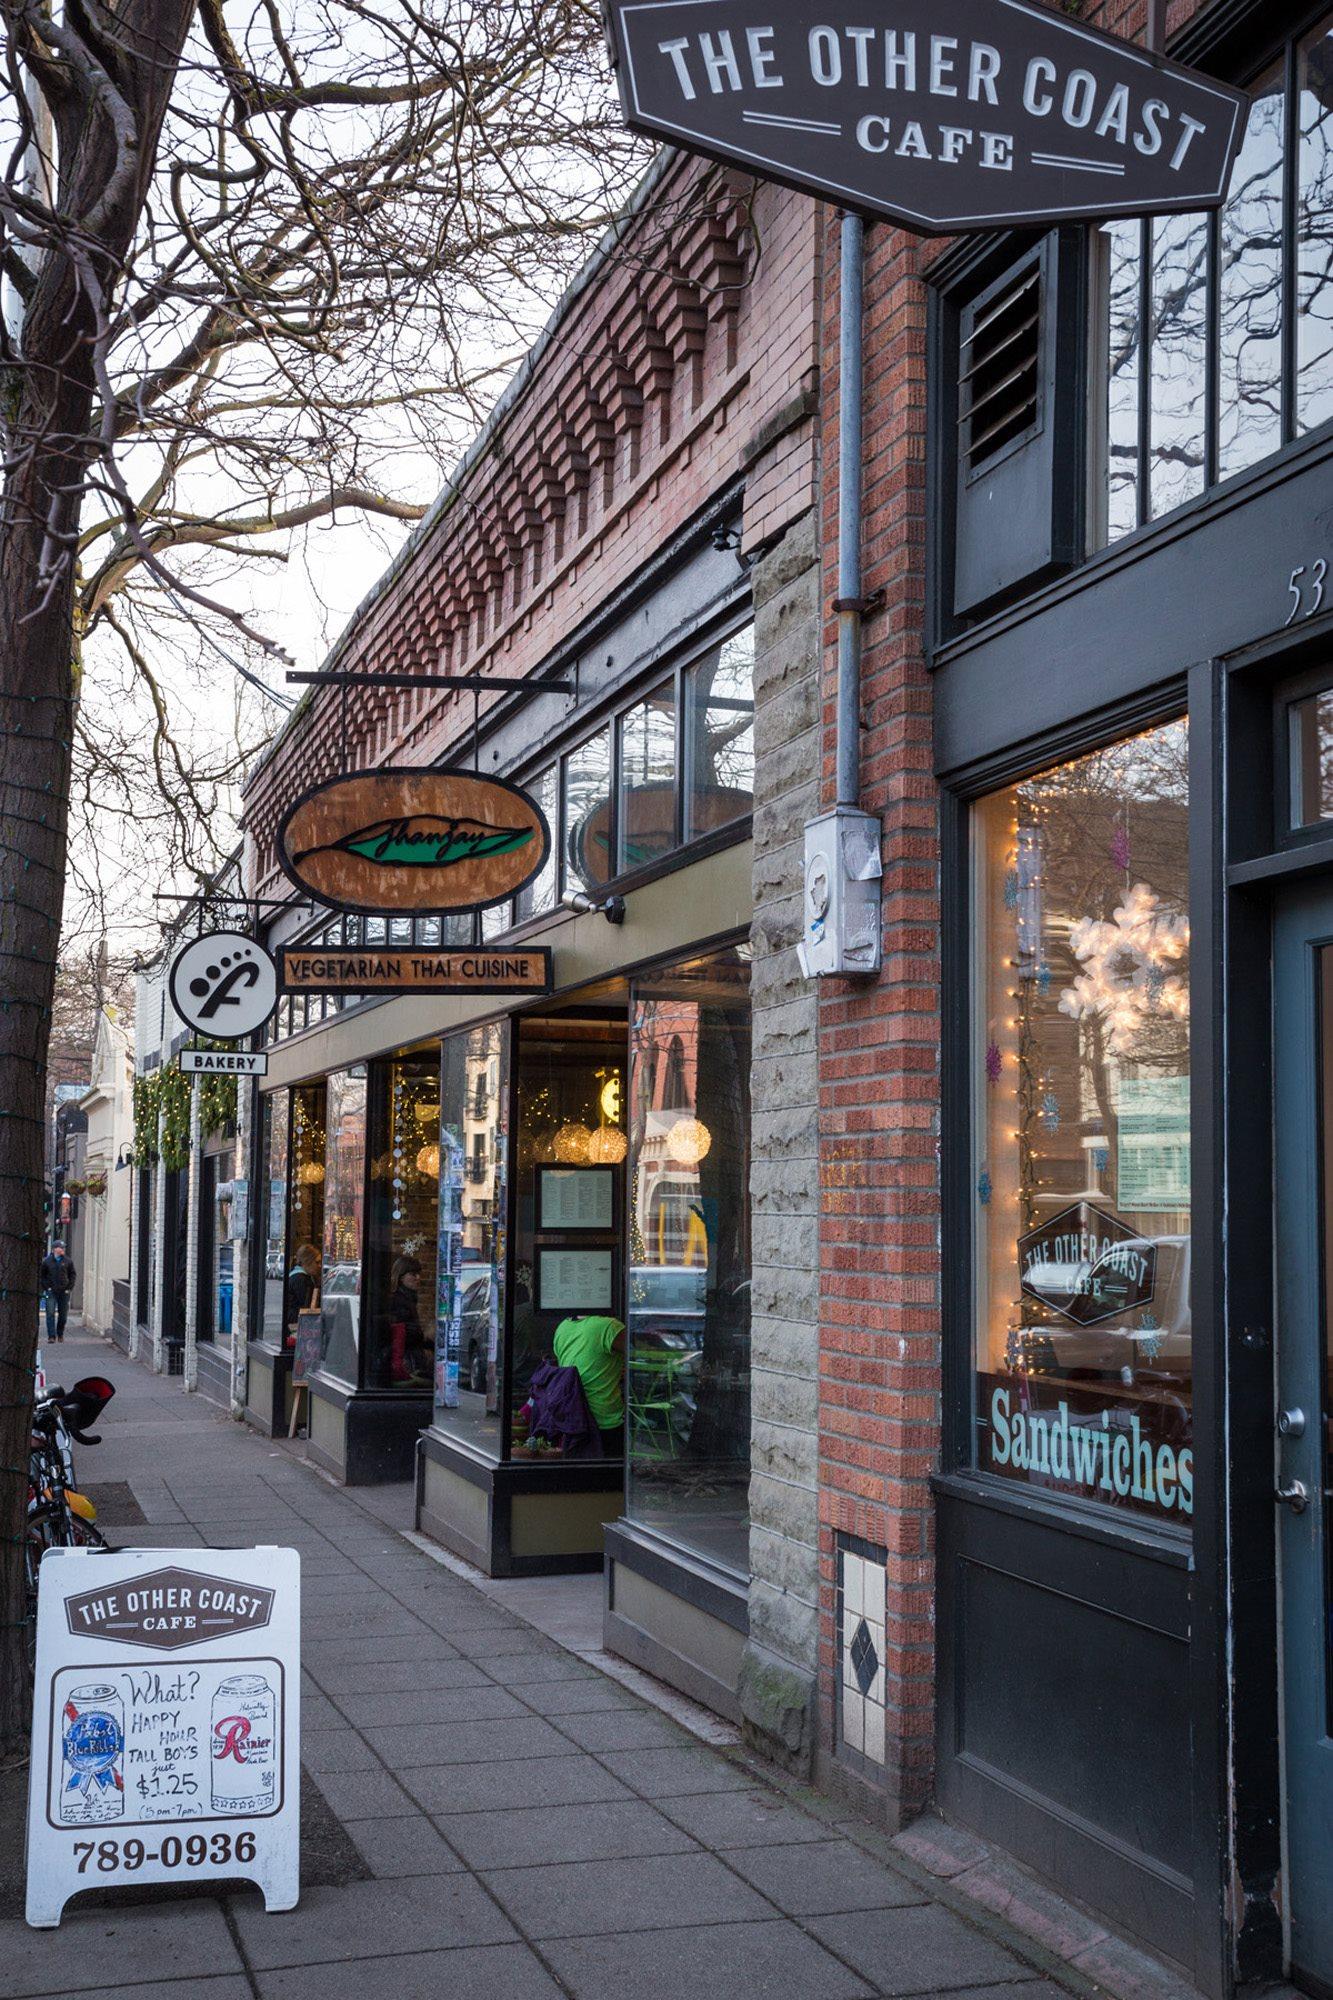 Seattle photogallery 59